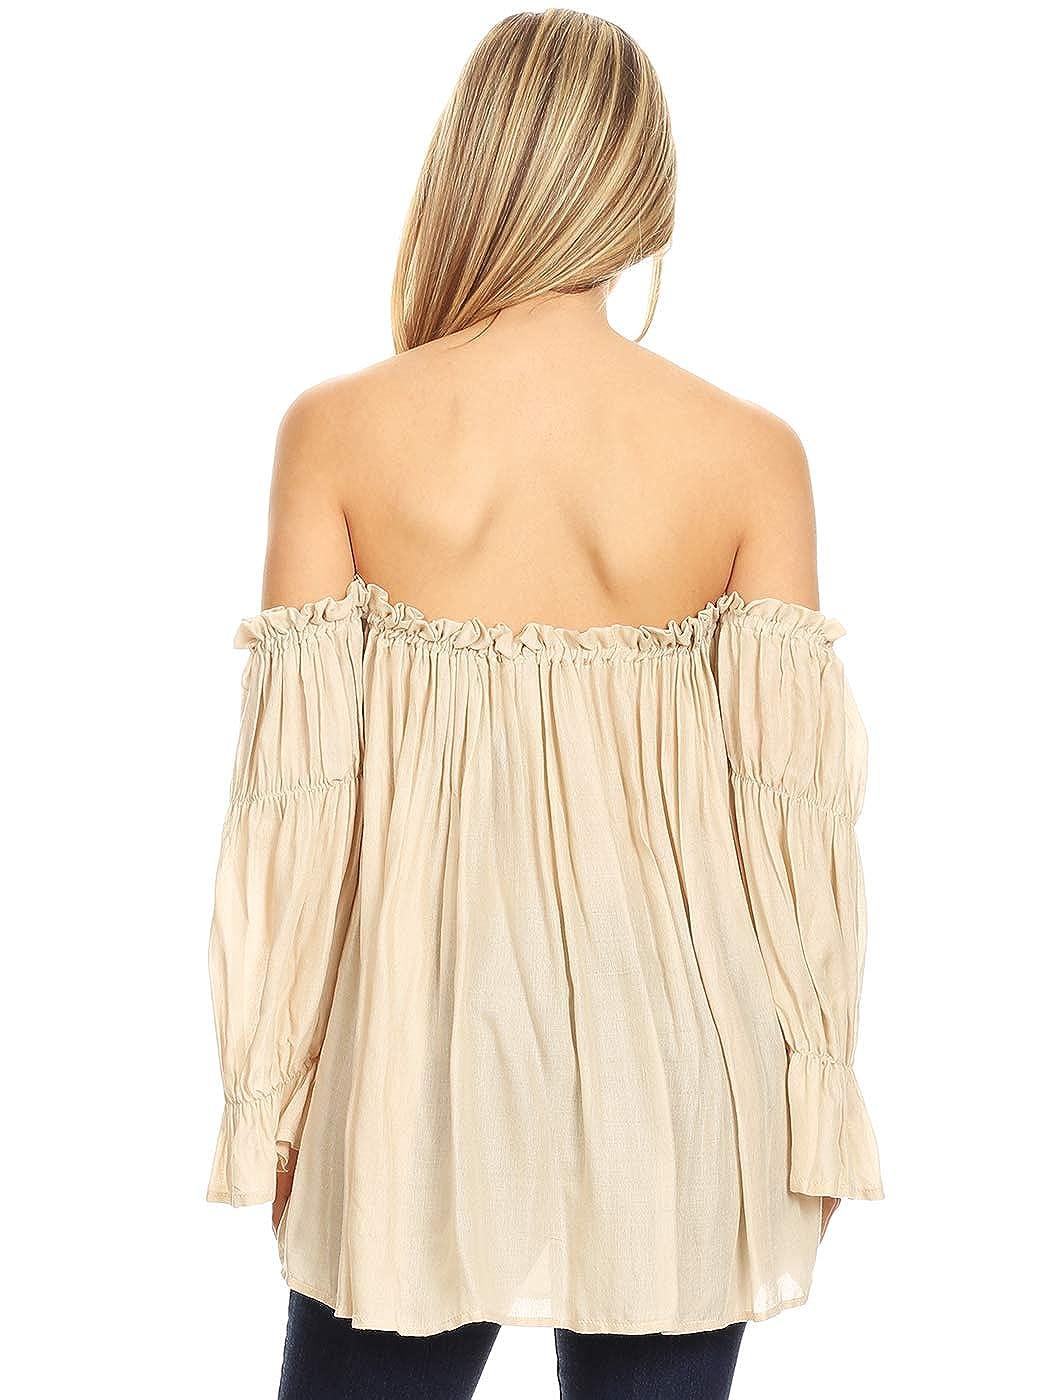 903490902e3 Anna-Kaci Womens Semi Sheer Boho Peasant Long Sleeve Off The Shoulder Top  at Amazon Women's Clothing store: